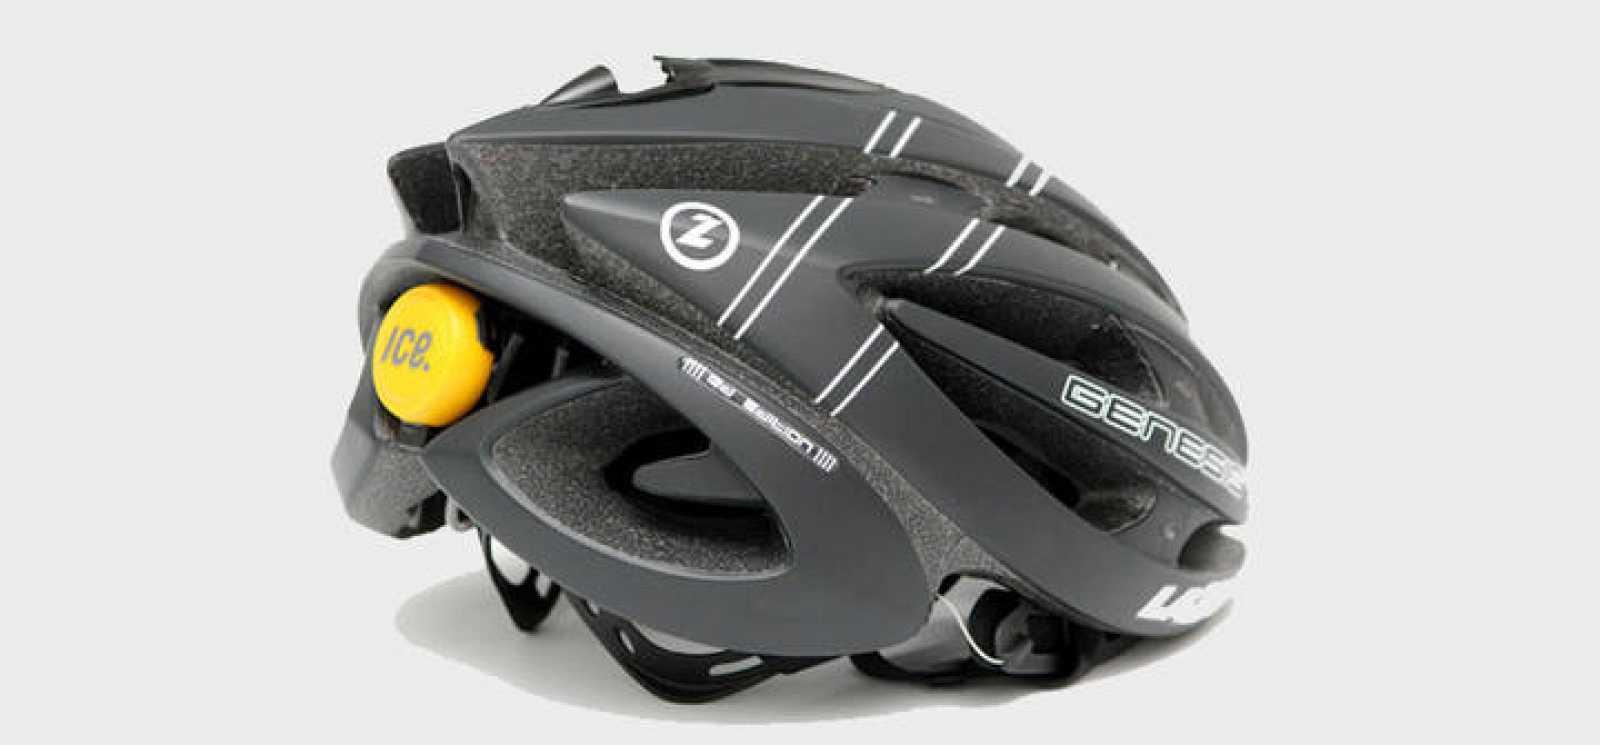 Un casco con el sensor que avisa a emergencias en caso de accidente.